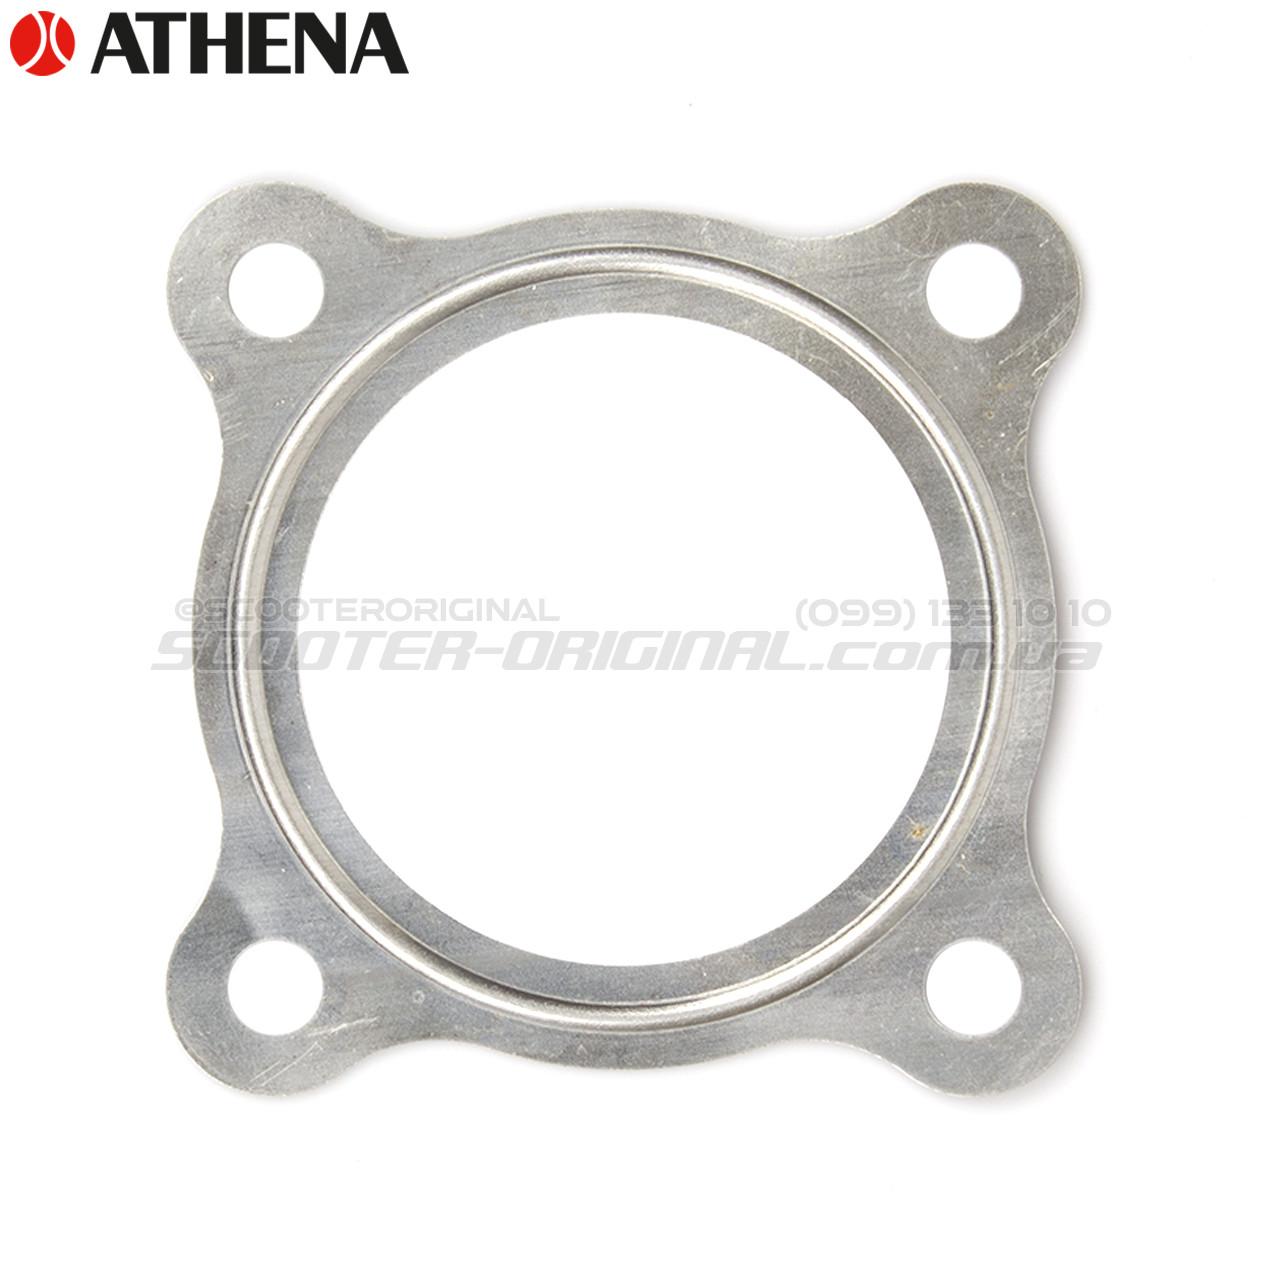 Прокладка головки цилиндра ATHENA 50сс Minarelli Vertical (Yamaha)